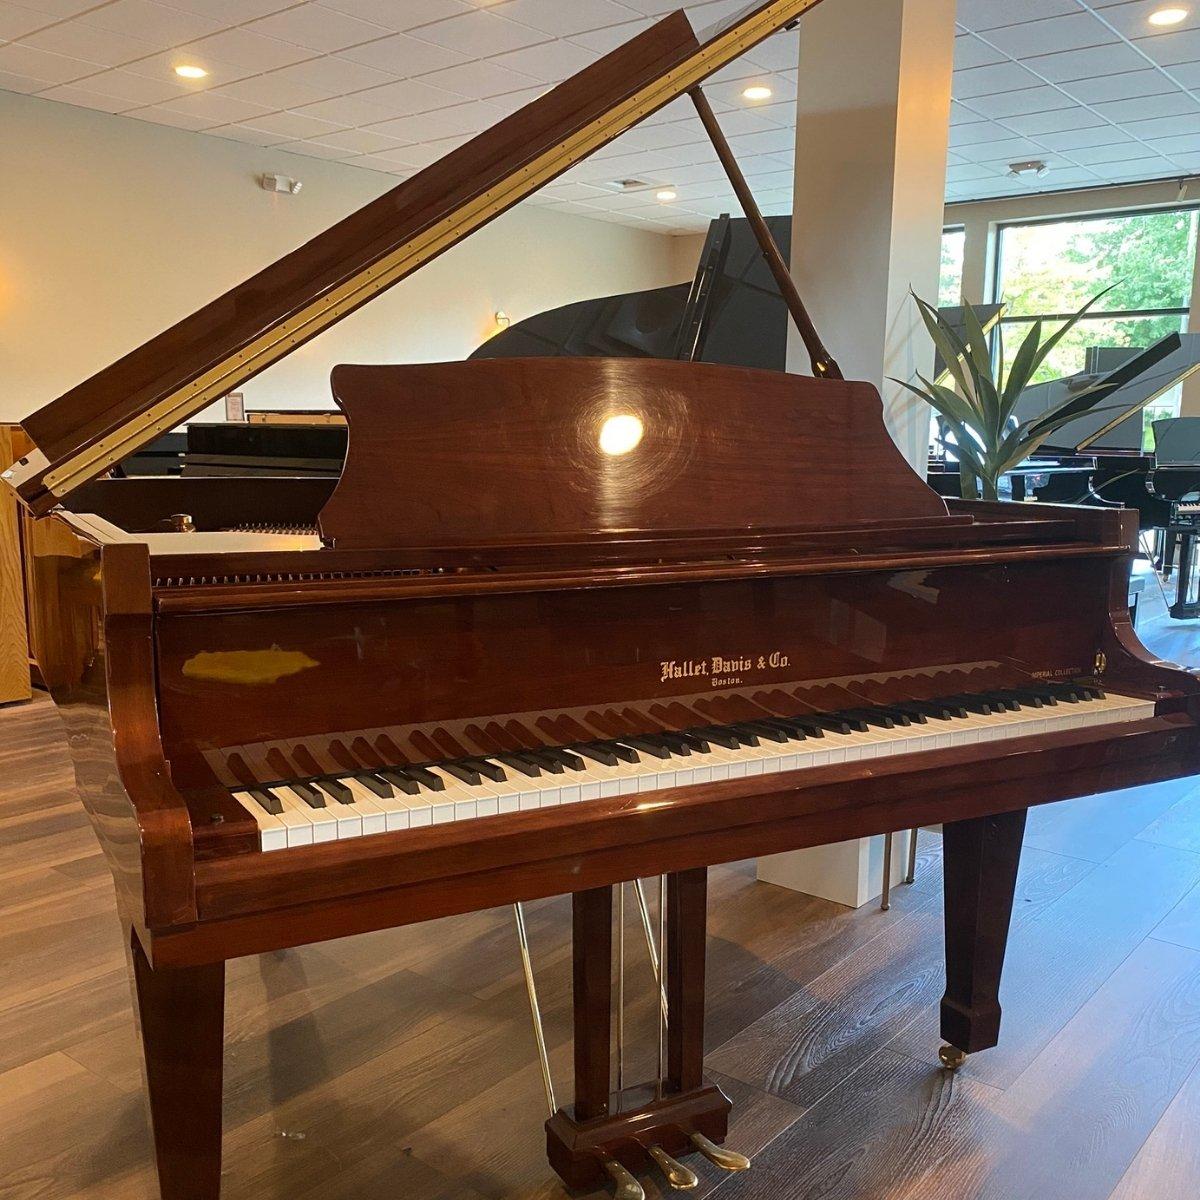 Hallet, Davis & Co. 5'3 Grand piano